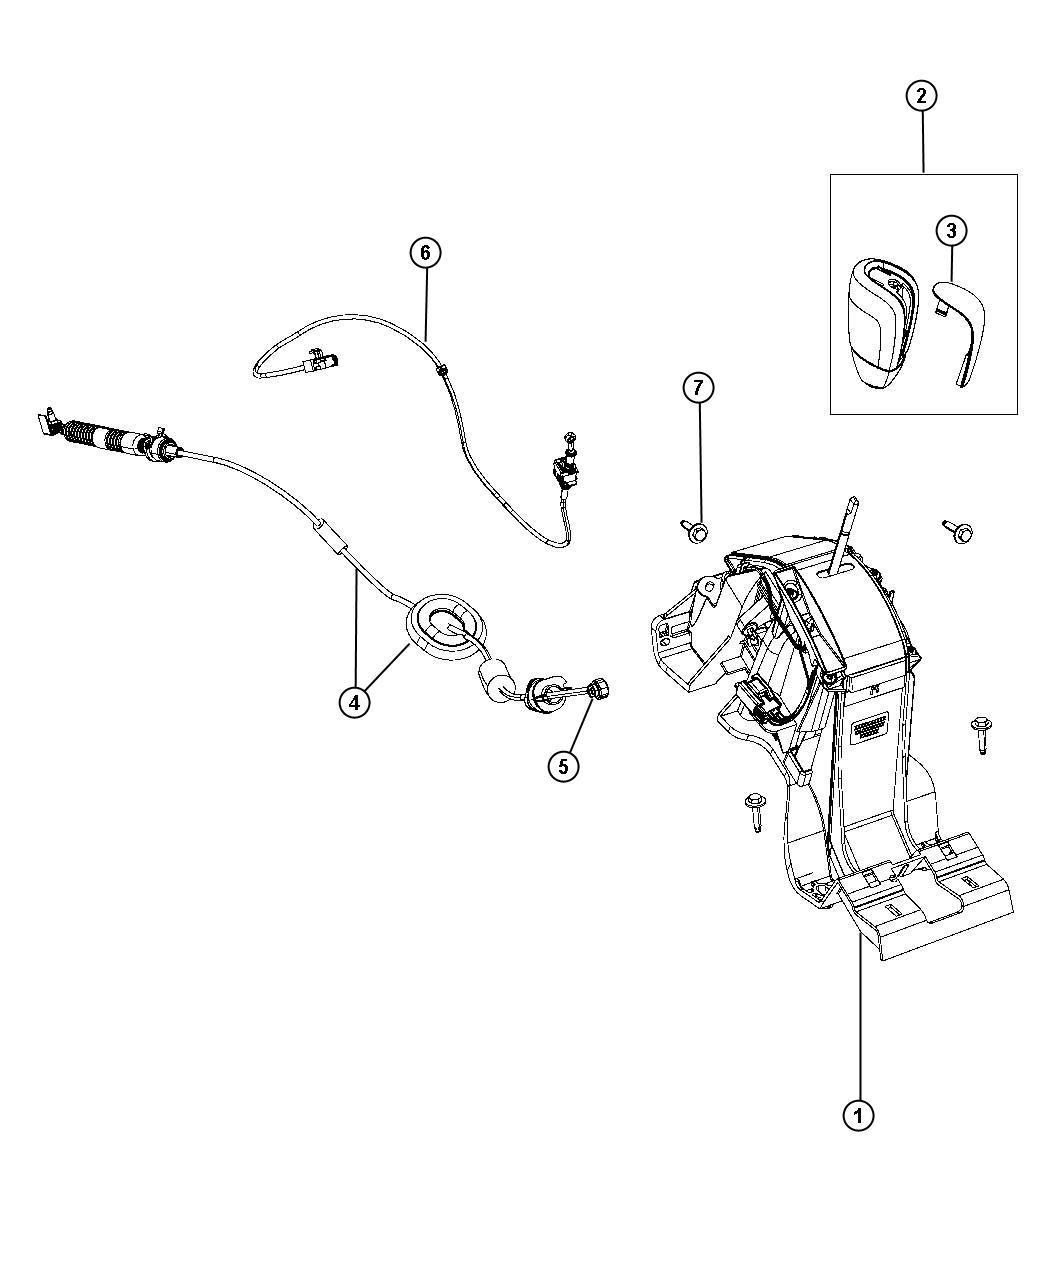 2012 Dodge Caliber Shifter. Transmission. With [autostick